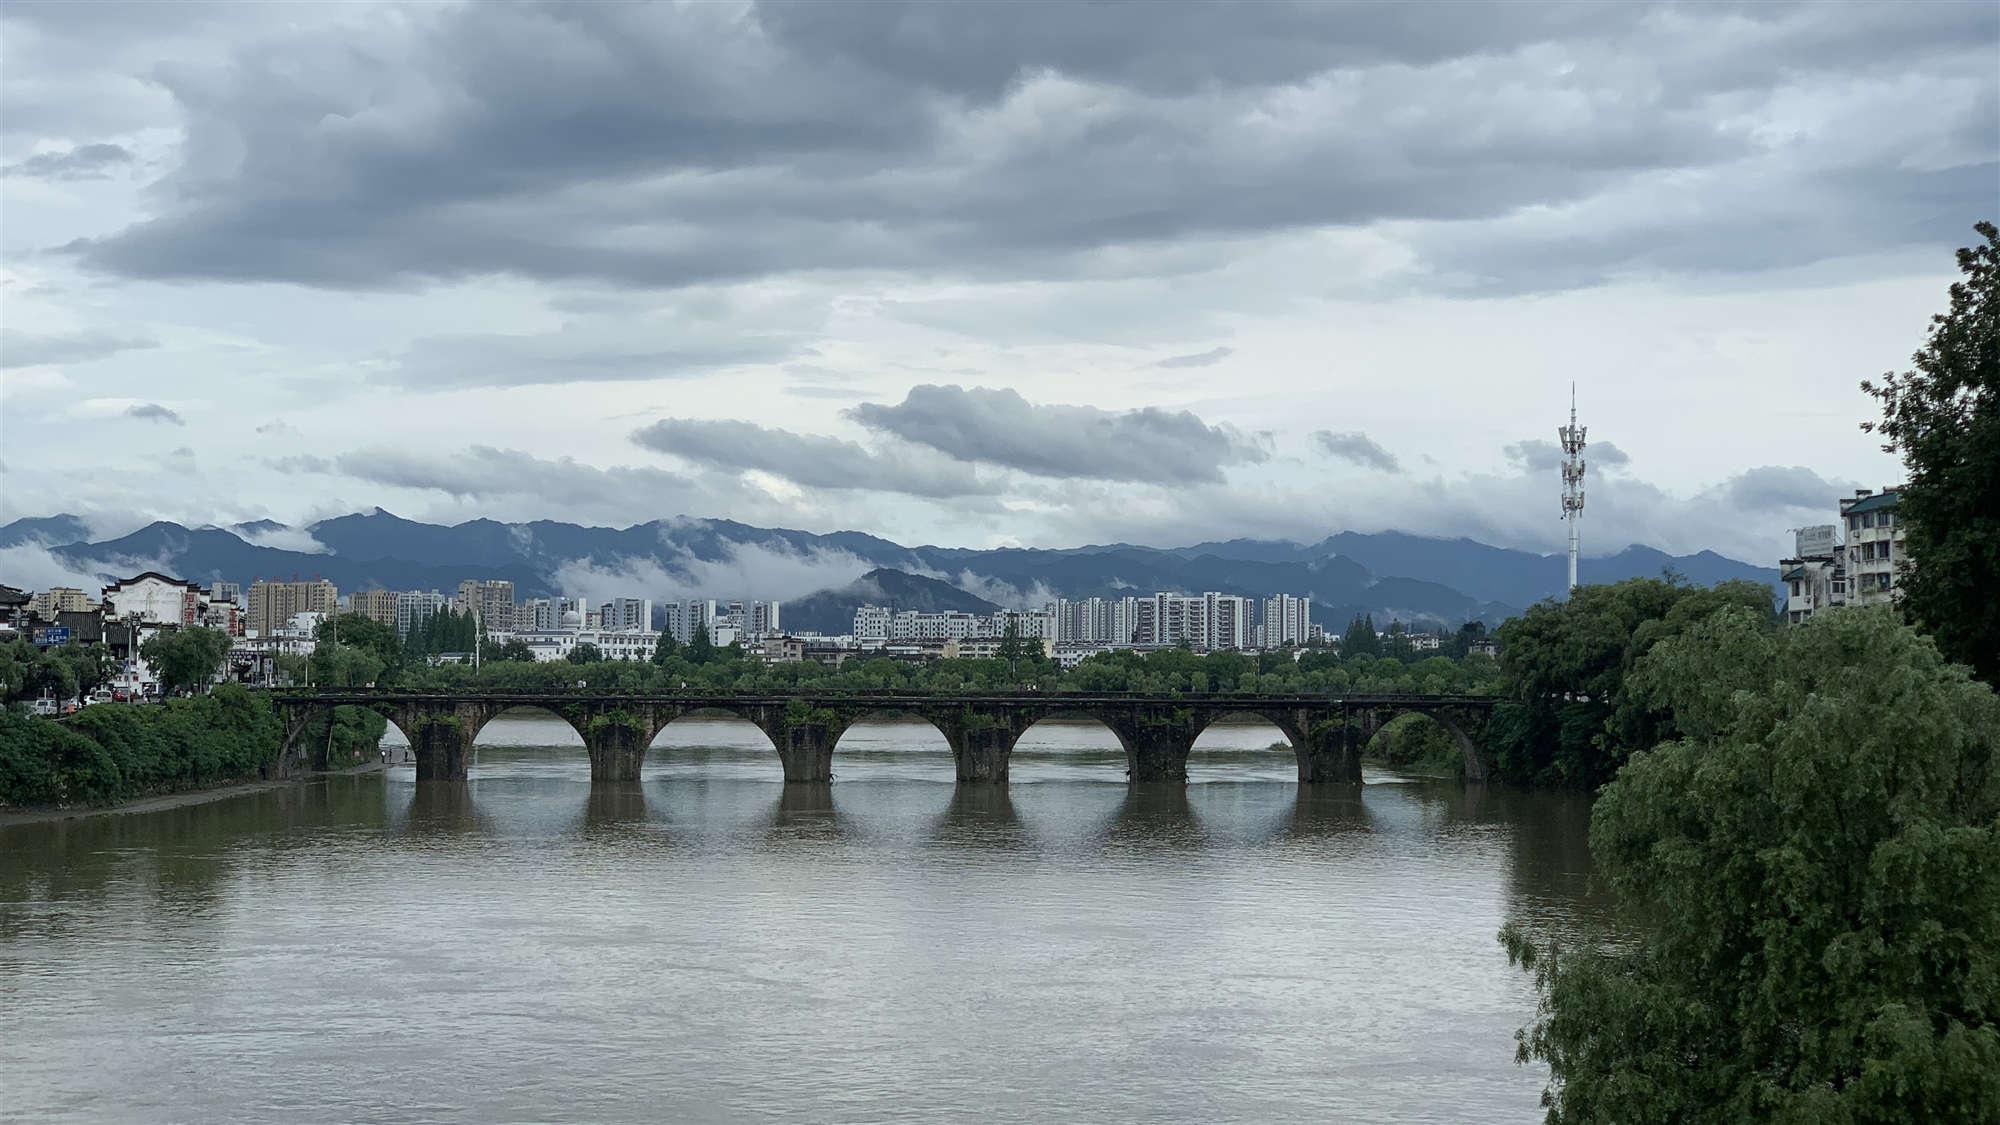 China lowers flood response to Level III